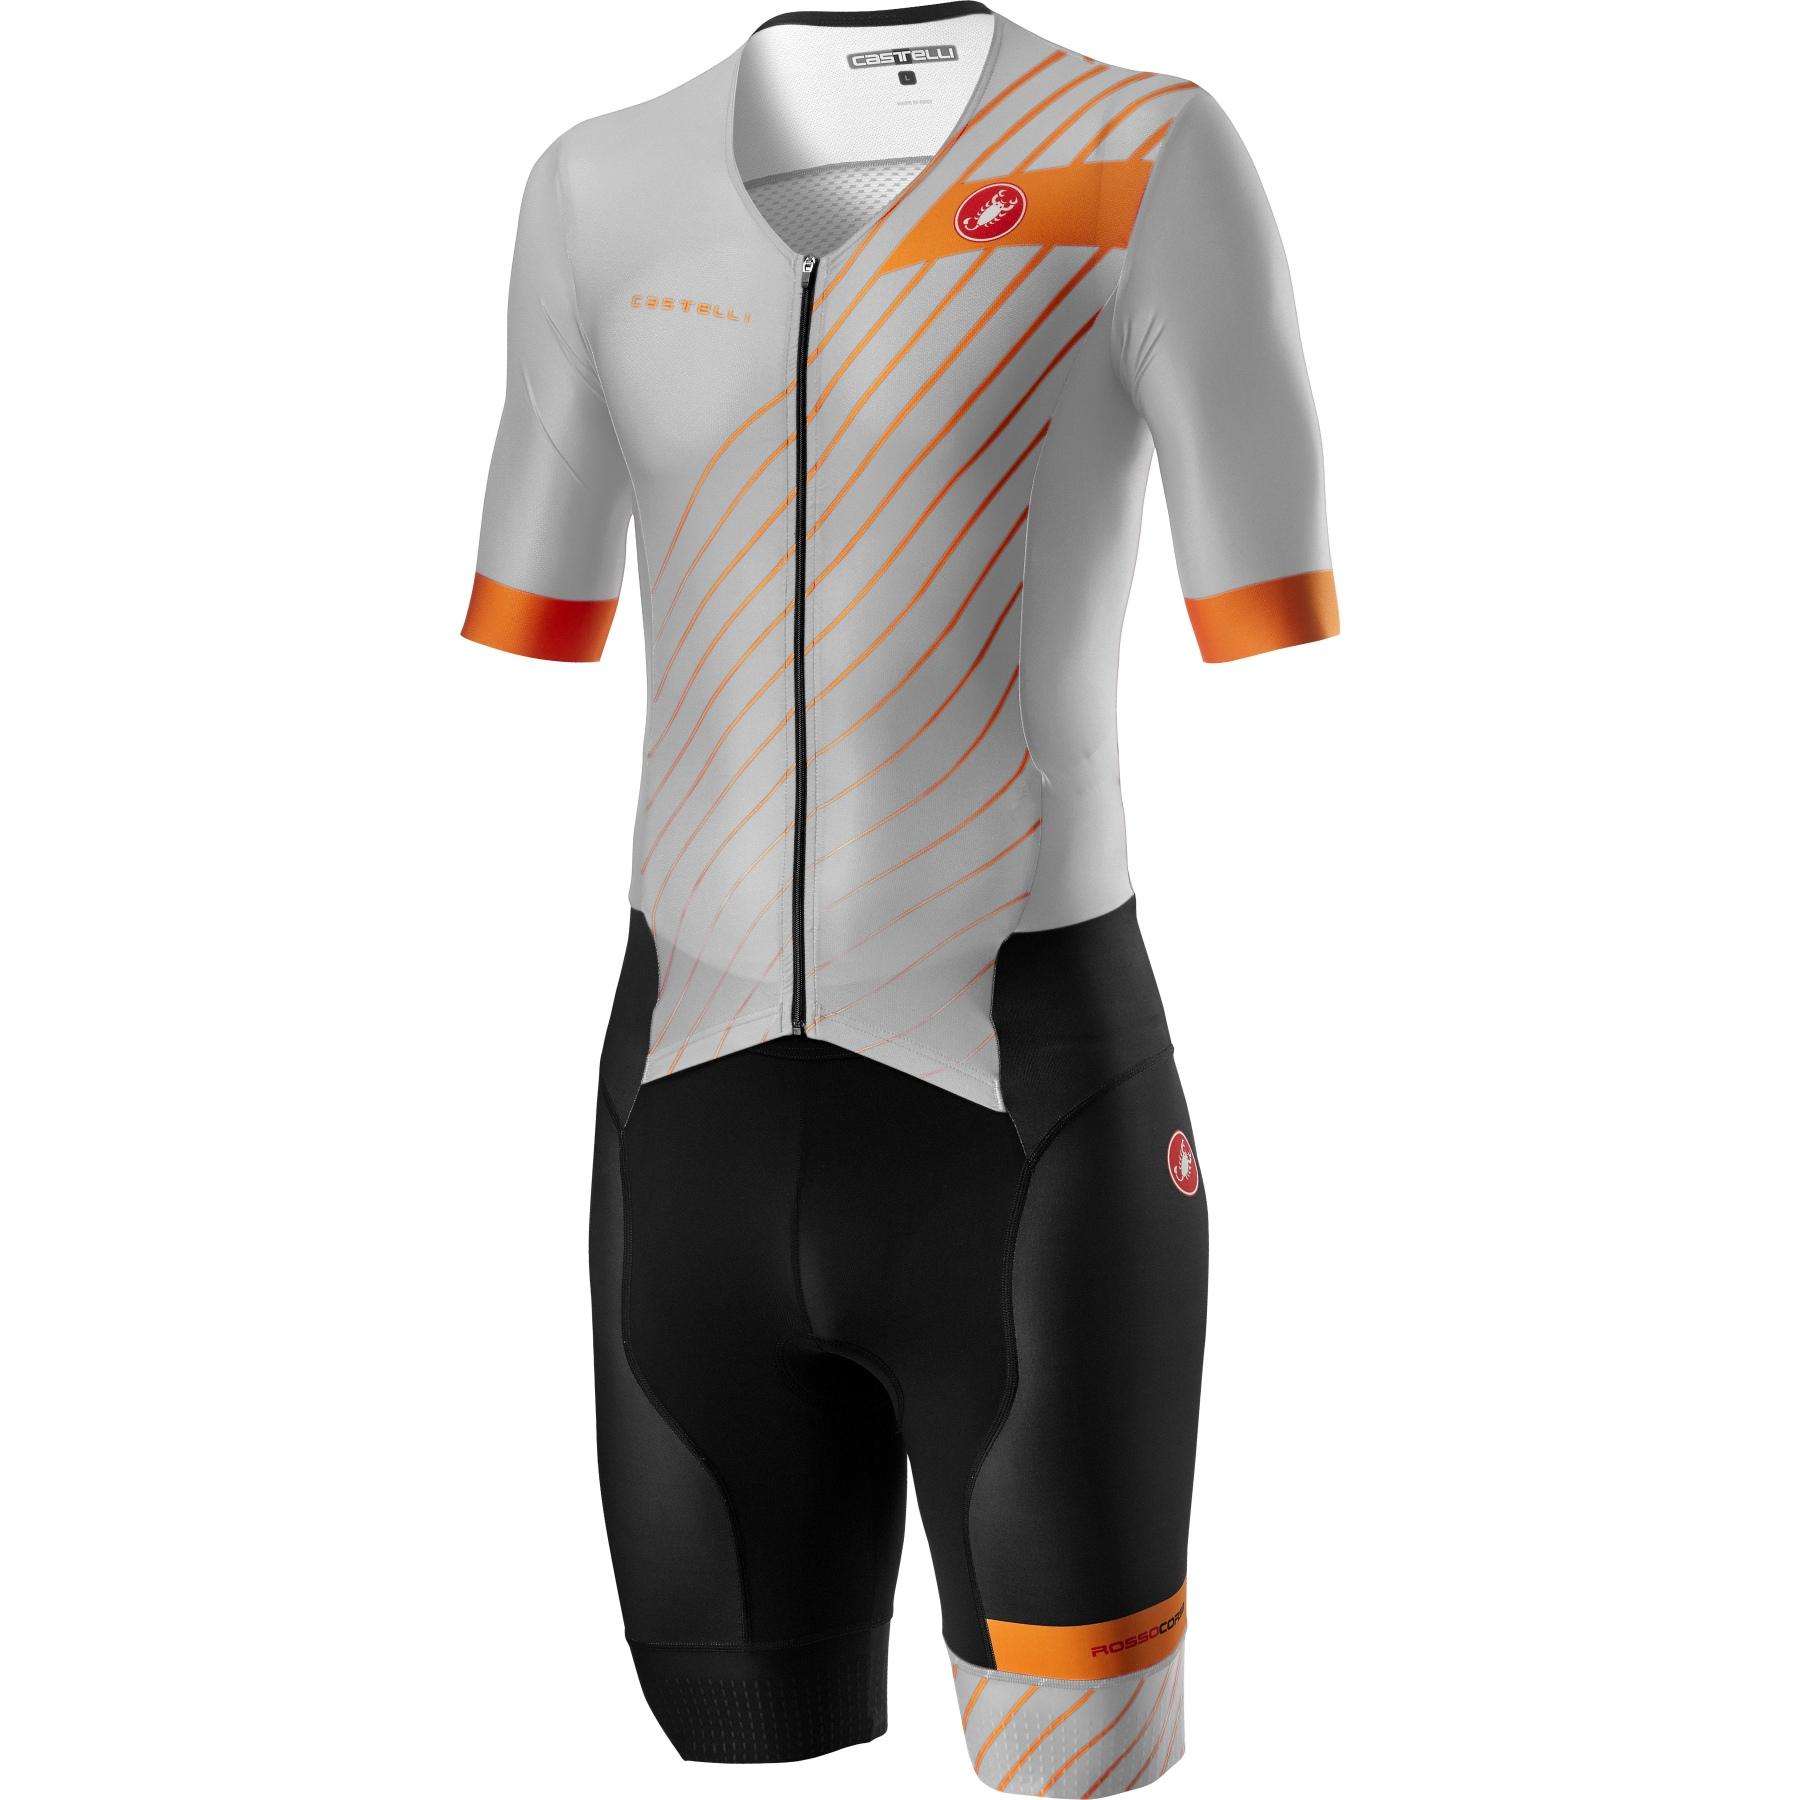 Castelli Free Sanremo 2 Suit Short Sleeve - silver grey/brilliant orange 870